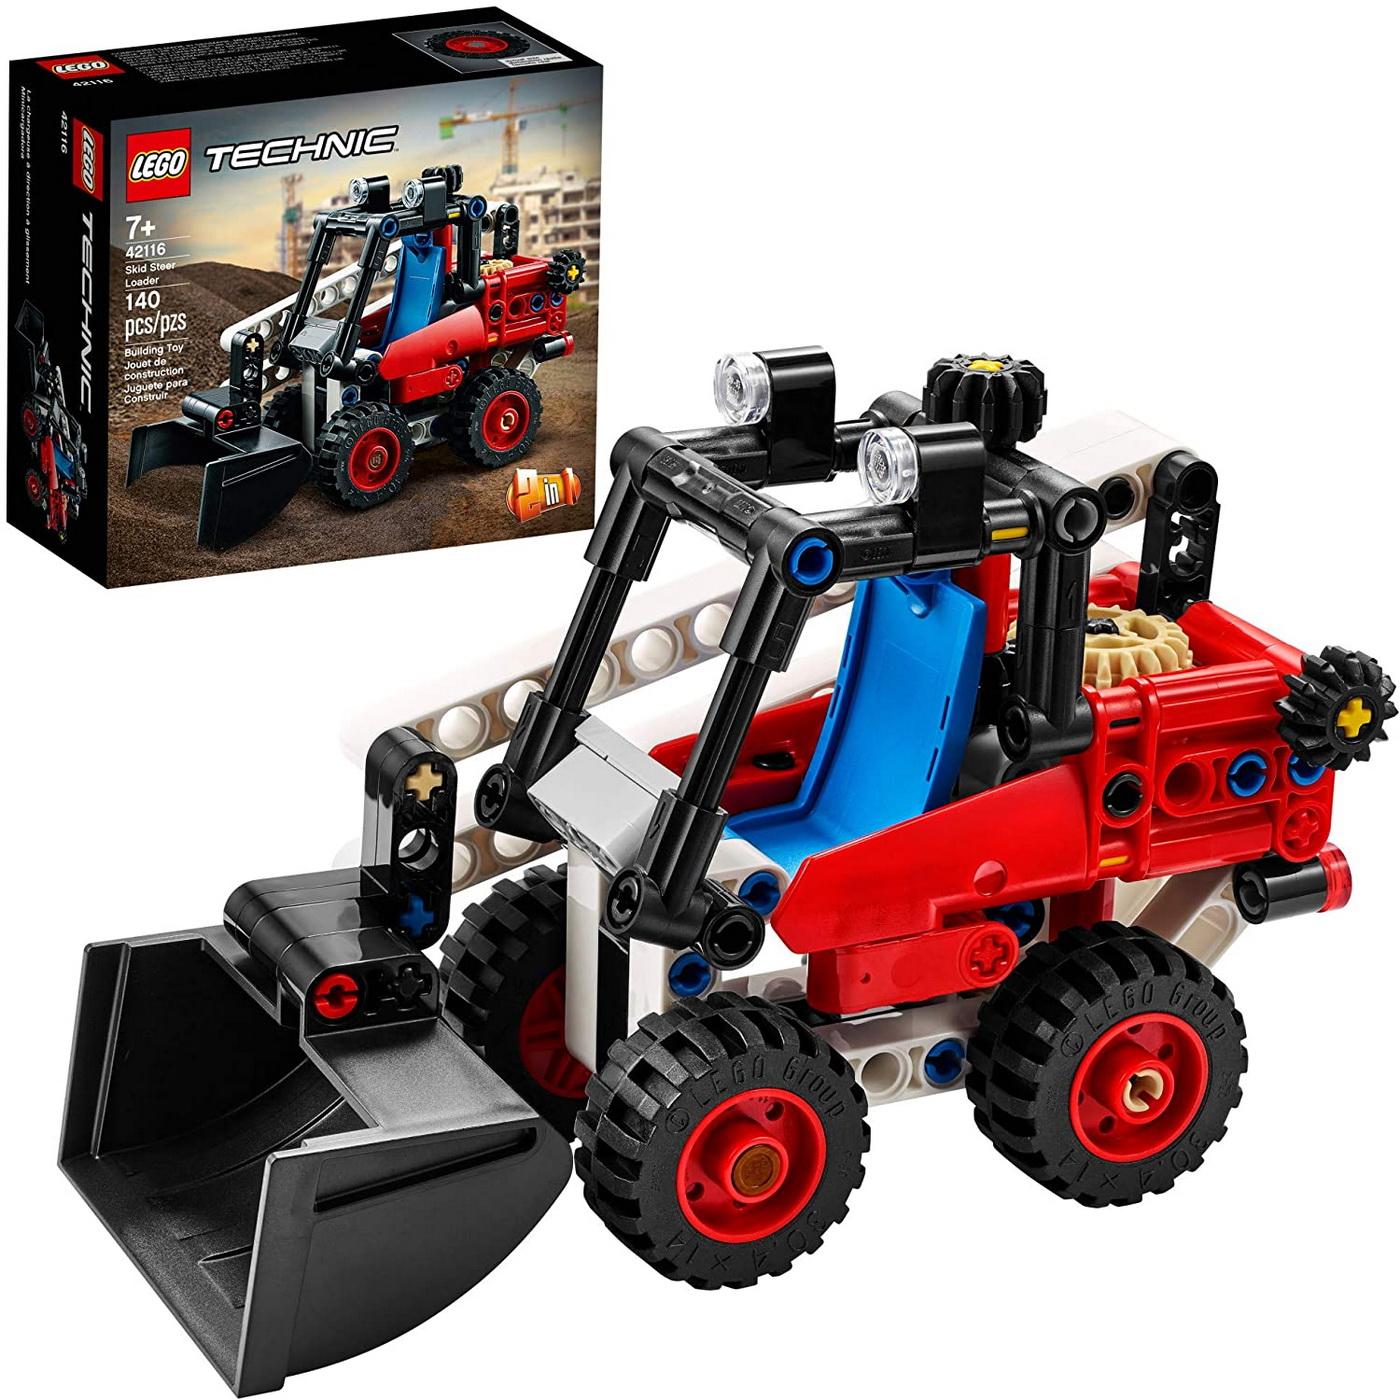 LEGO Technic - Skid Steer Loader (42116)   LEGO - 8